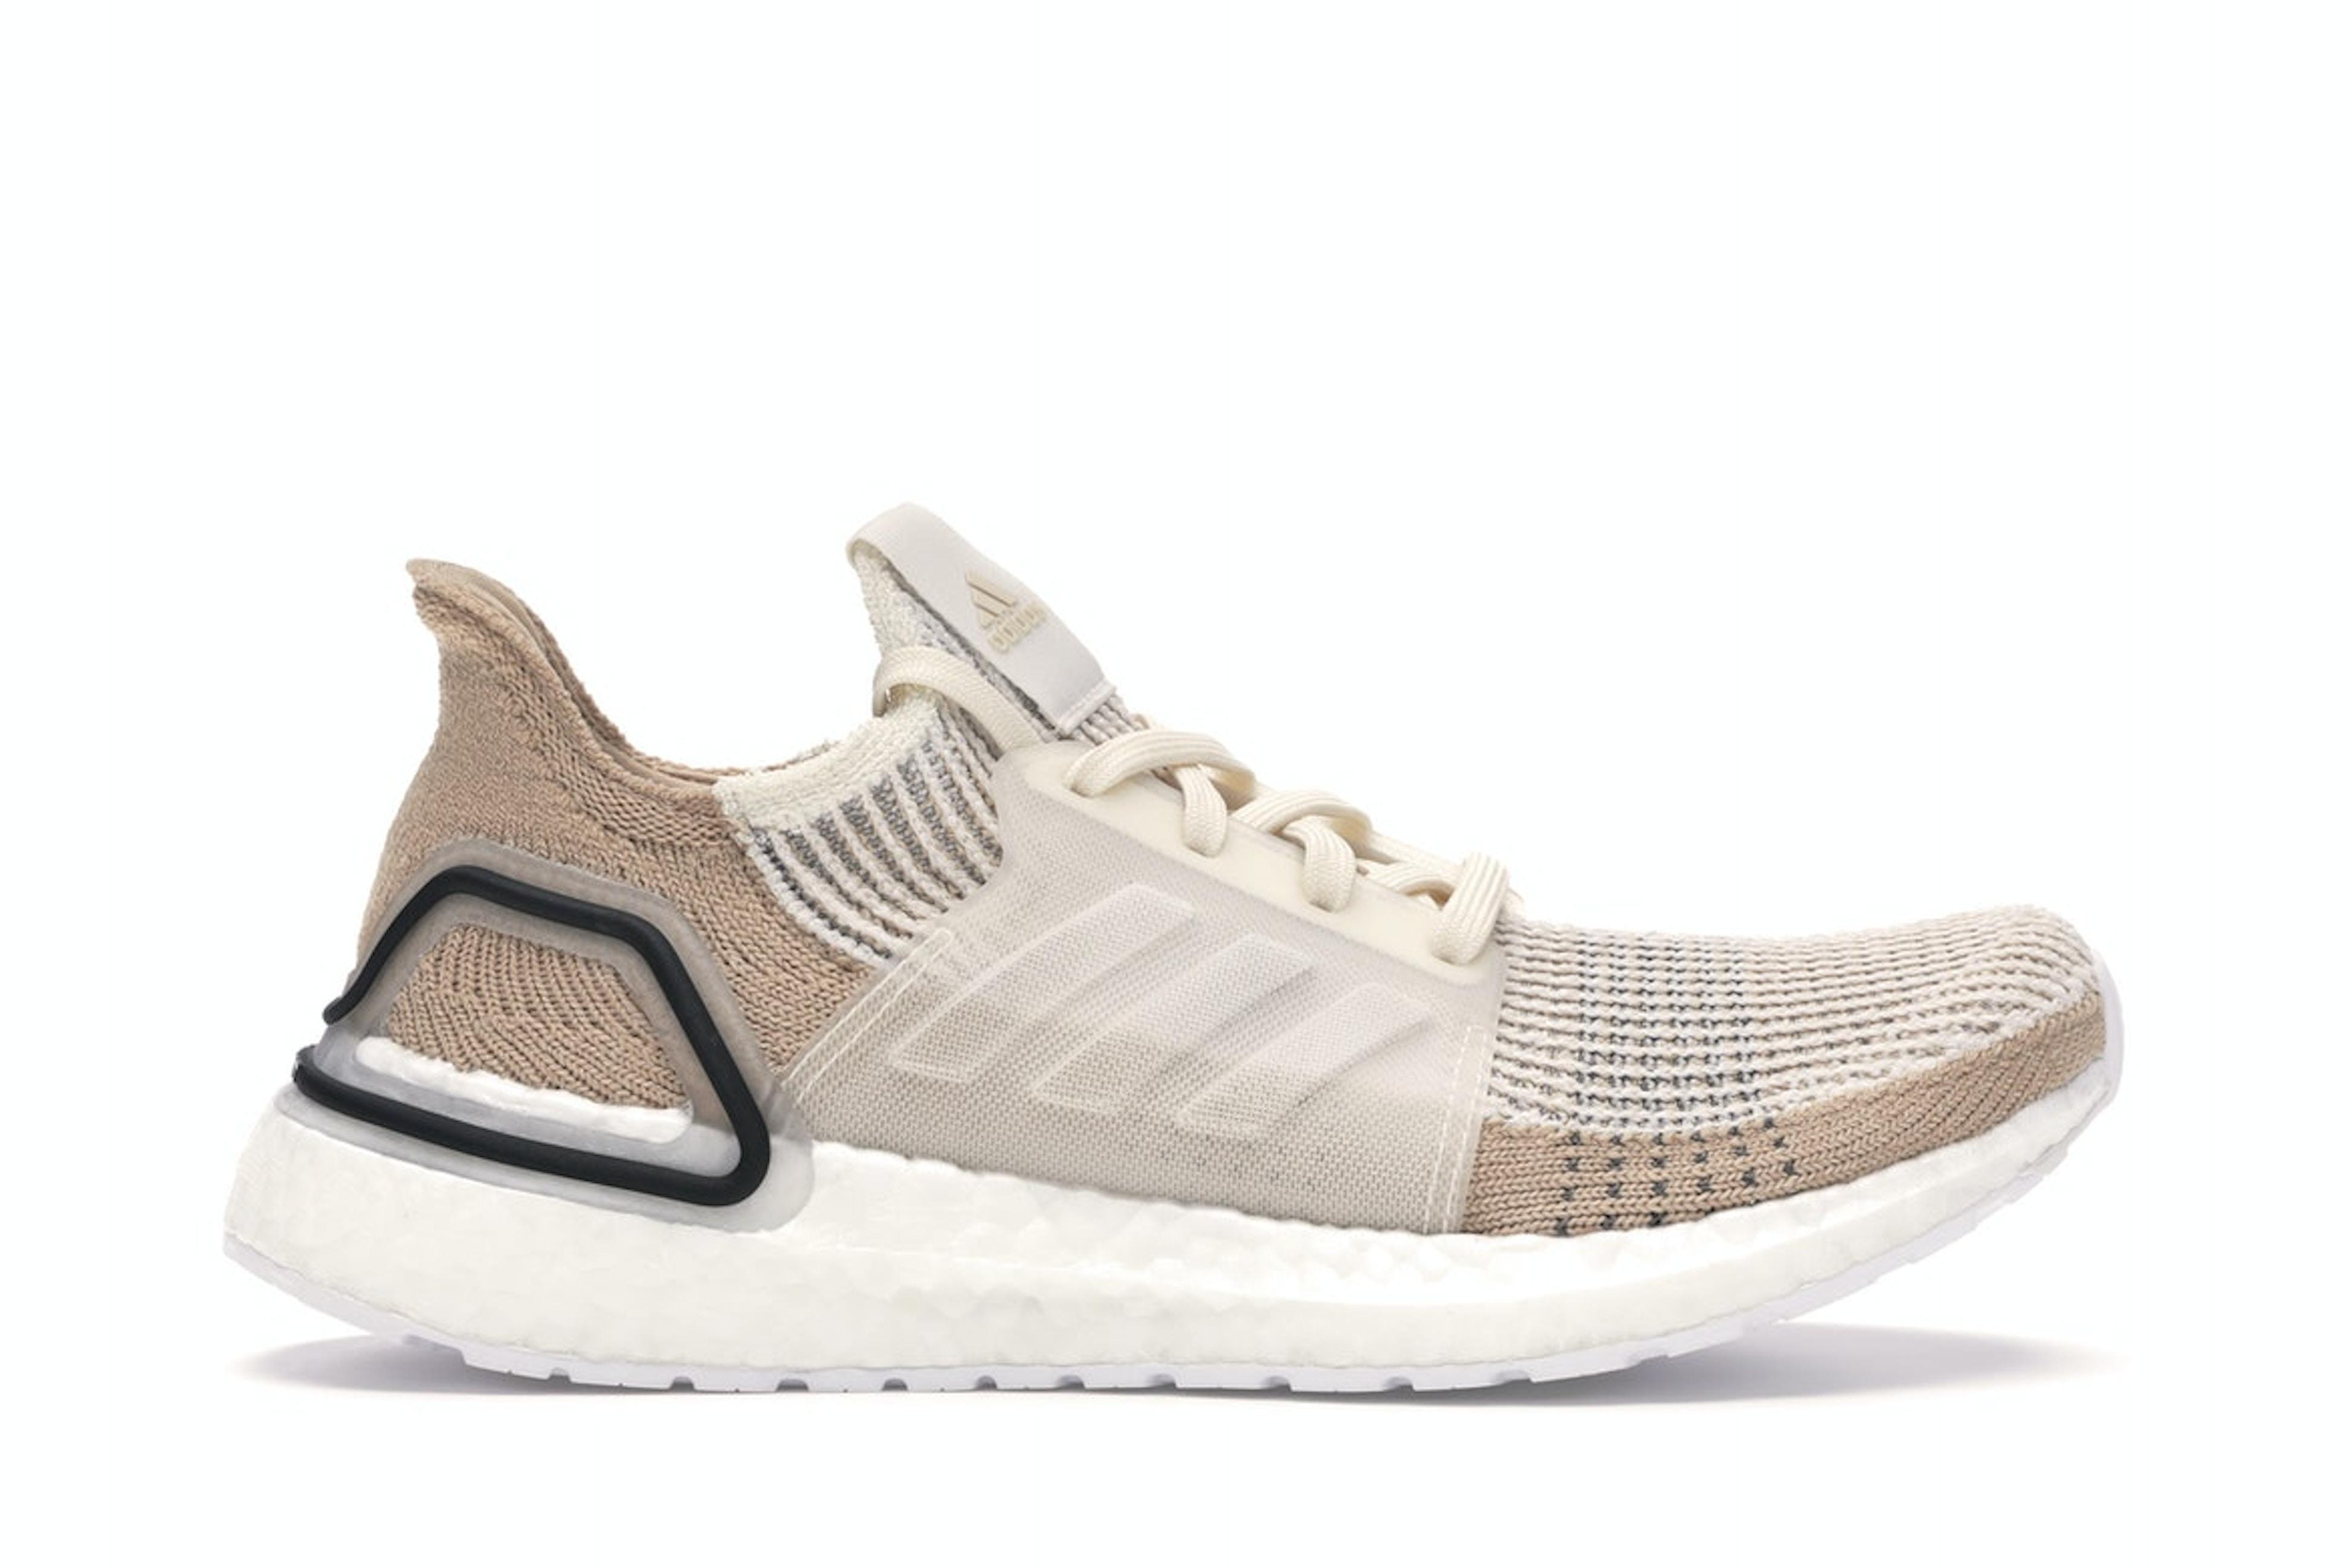 Adidas Ultra Boost 5.0 2019 Chalk White Pale Nude B75878